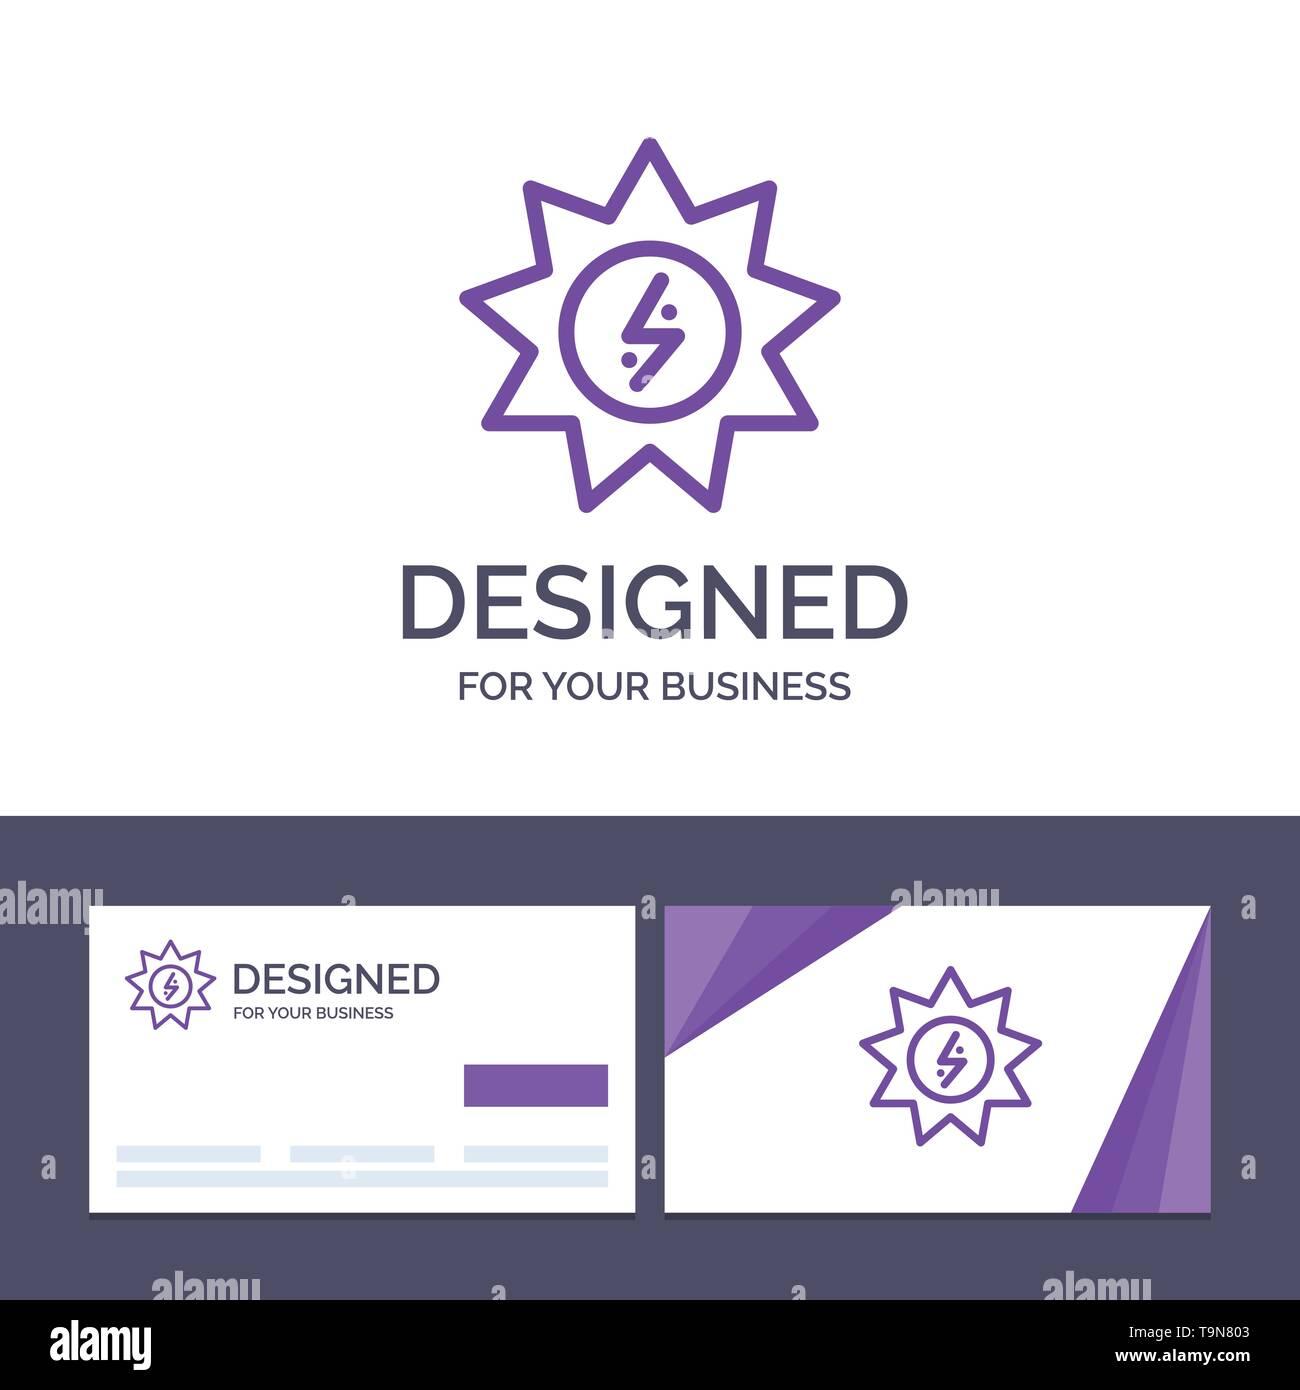 Creative Business Card und Logo Vorlage Energie, Solar, Energie, Power Vector Illustration Stockbild